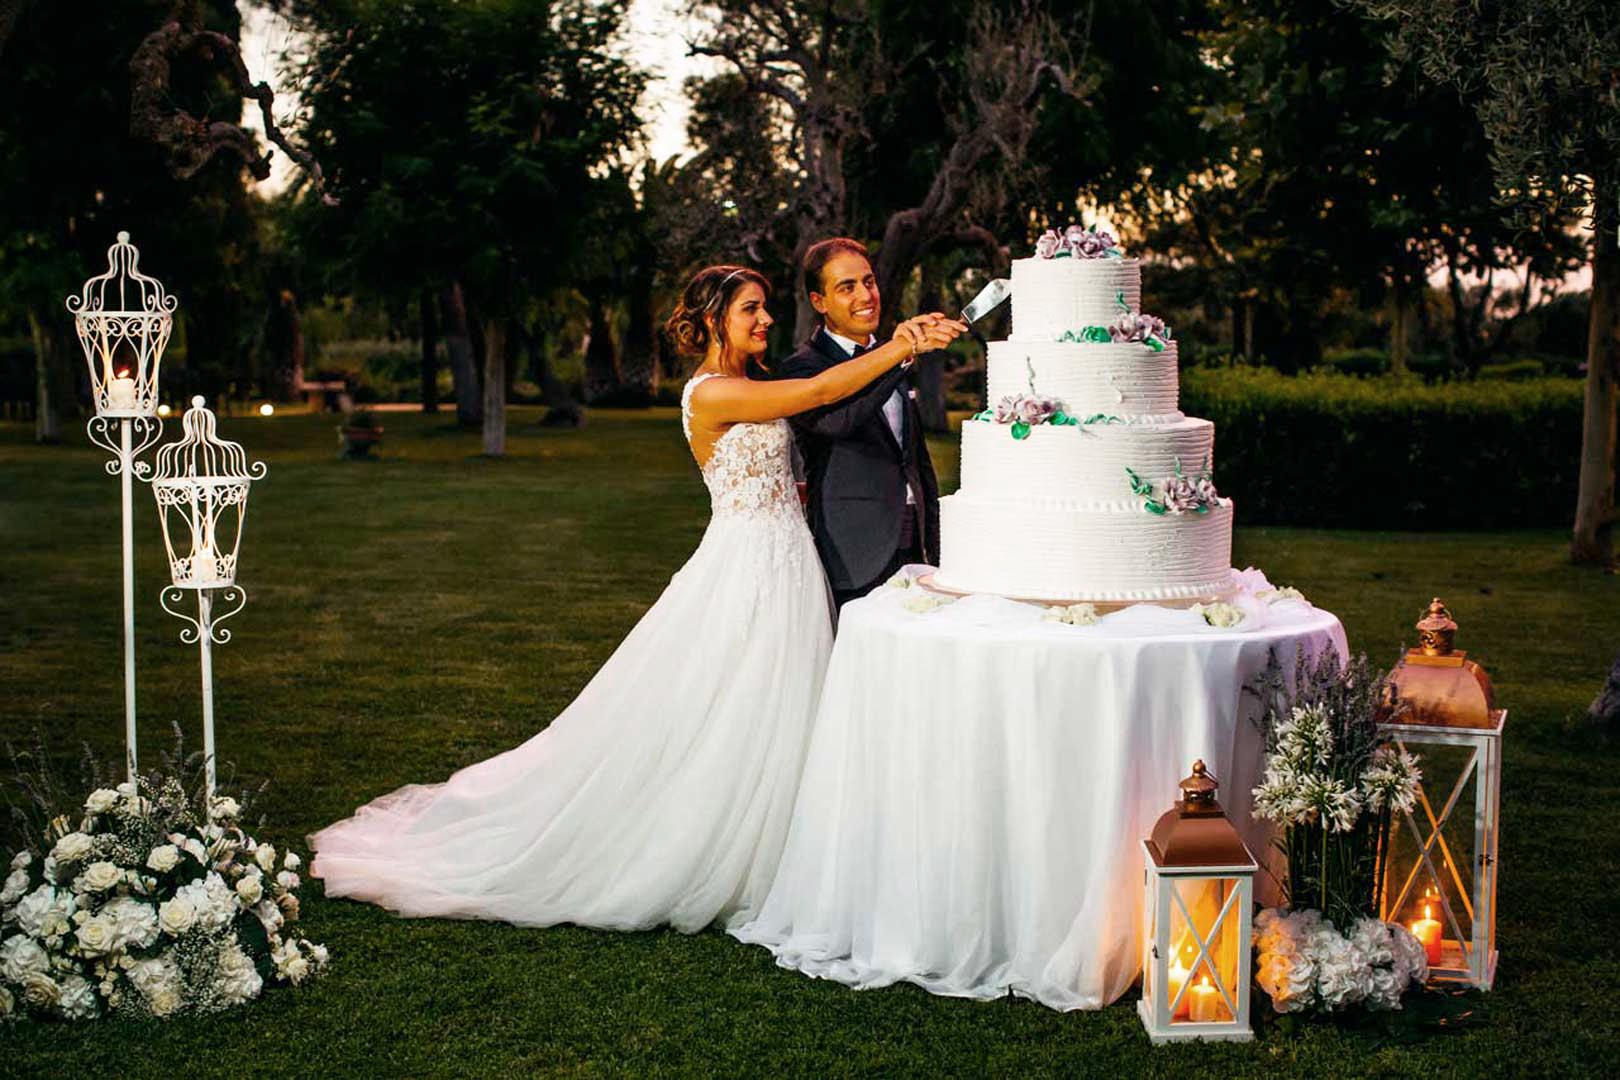 043-torta-nunziale-matrimonio-gianni-lepore-fotografo